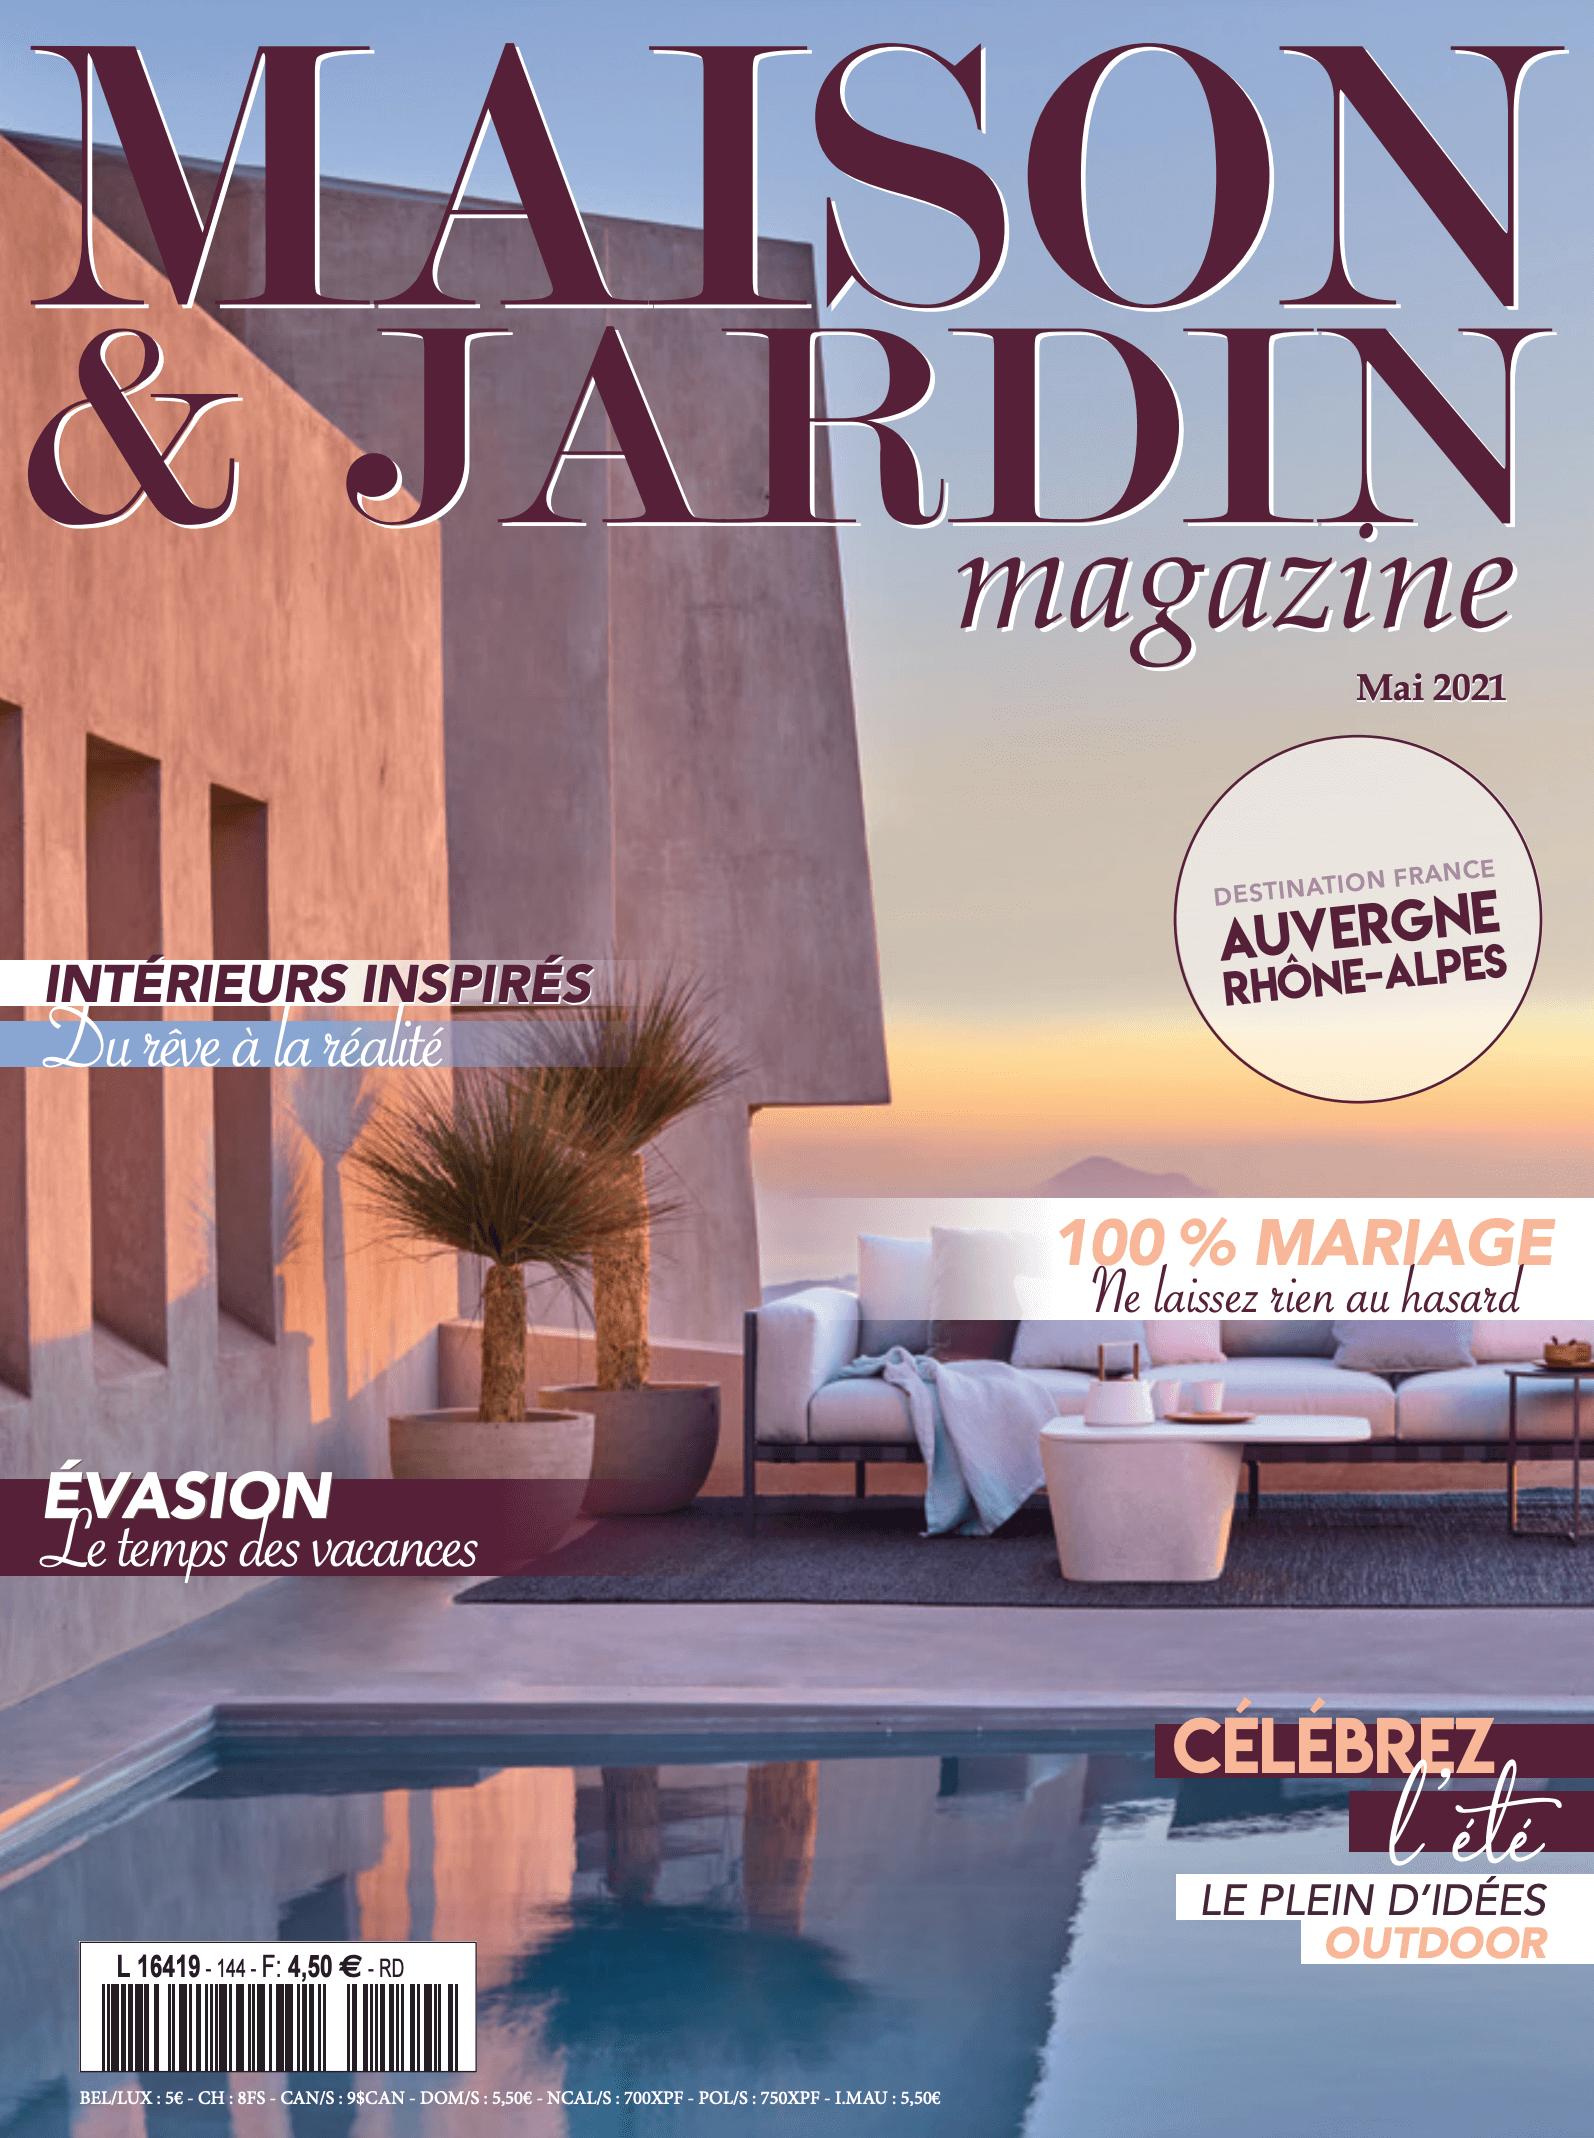 Altobuy sur Maison & Jardin magazine Mai 2021